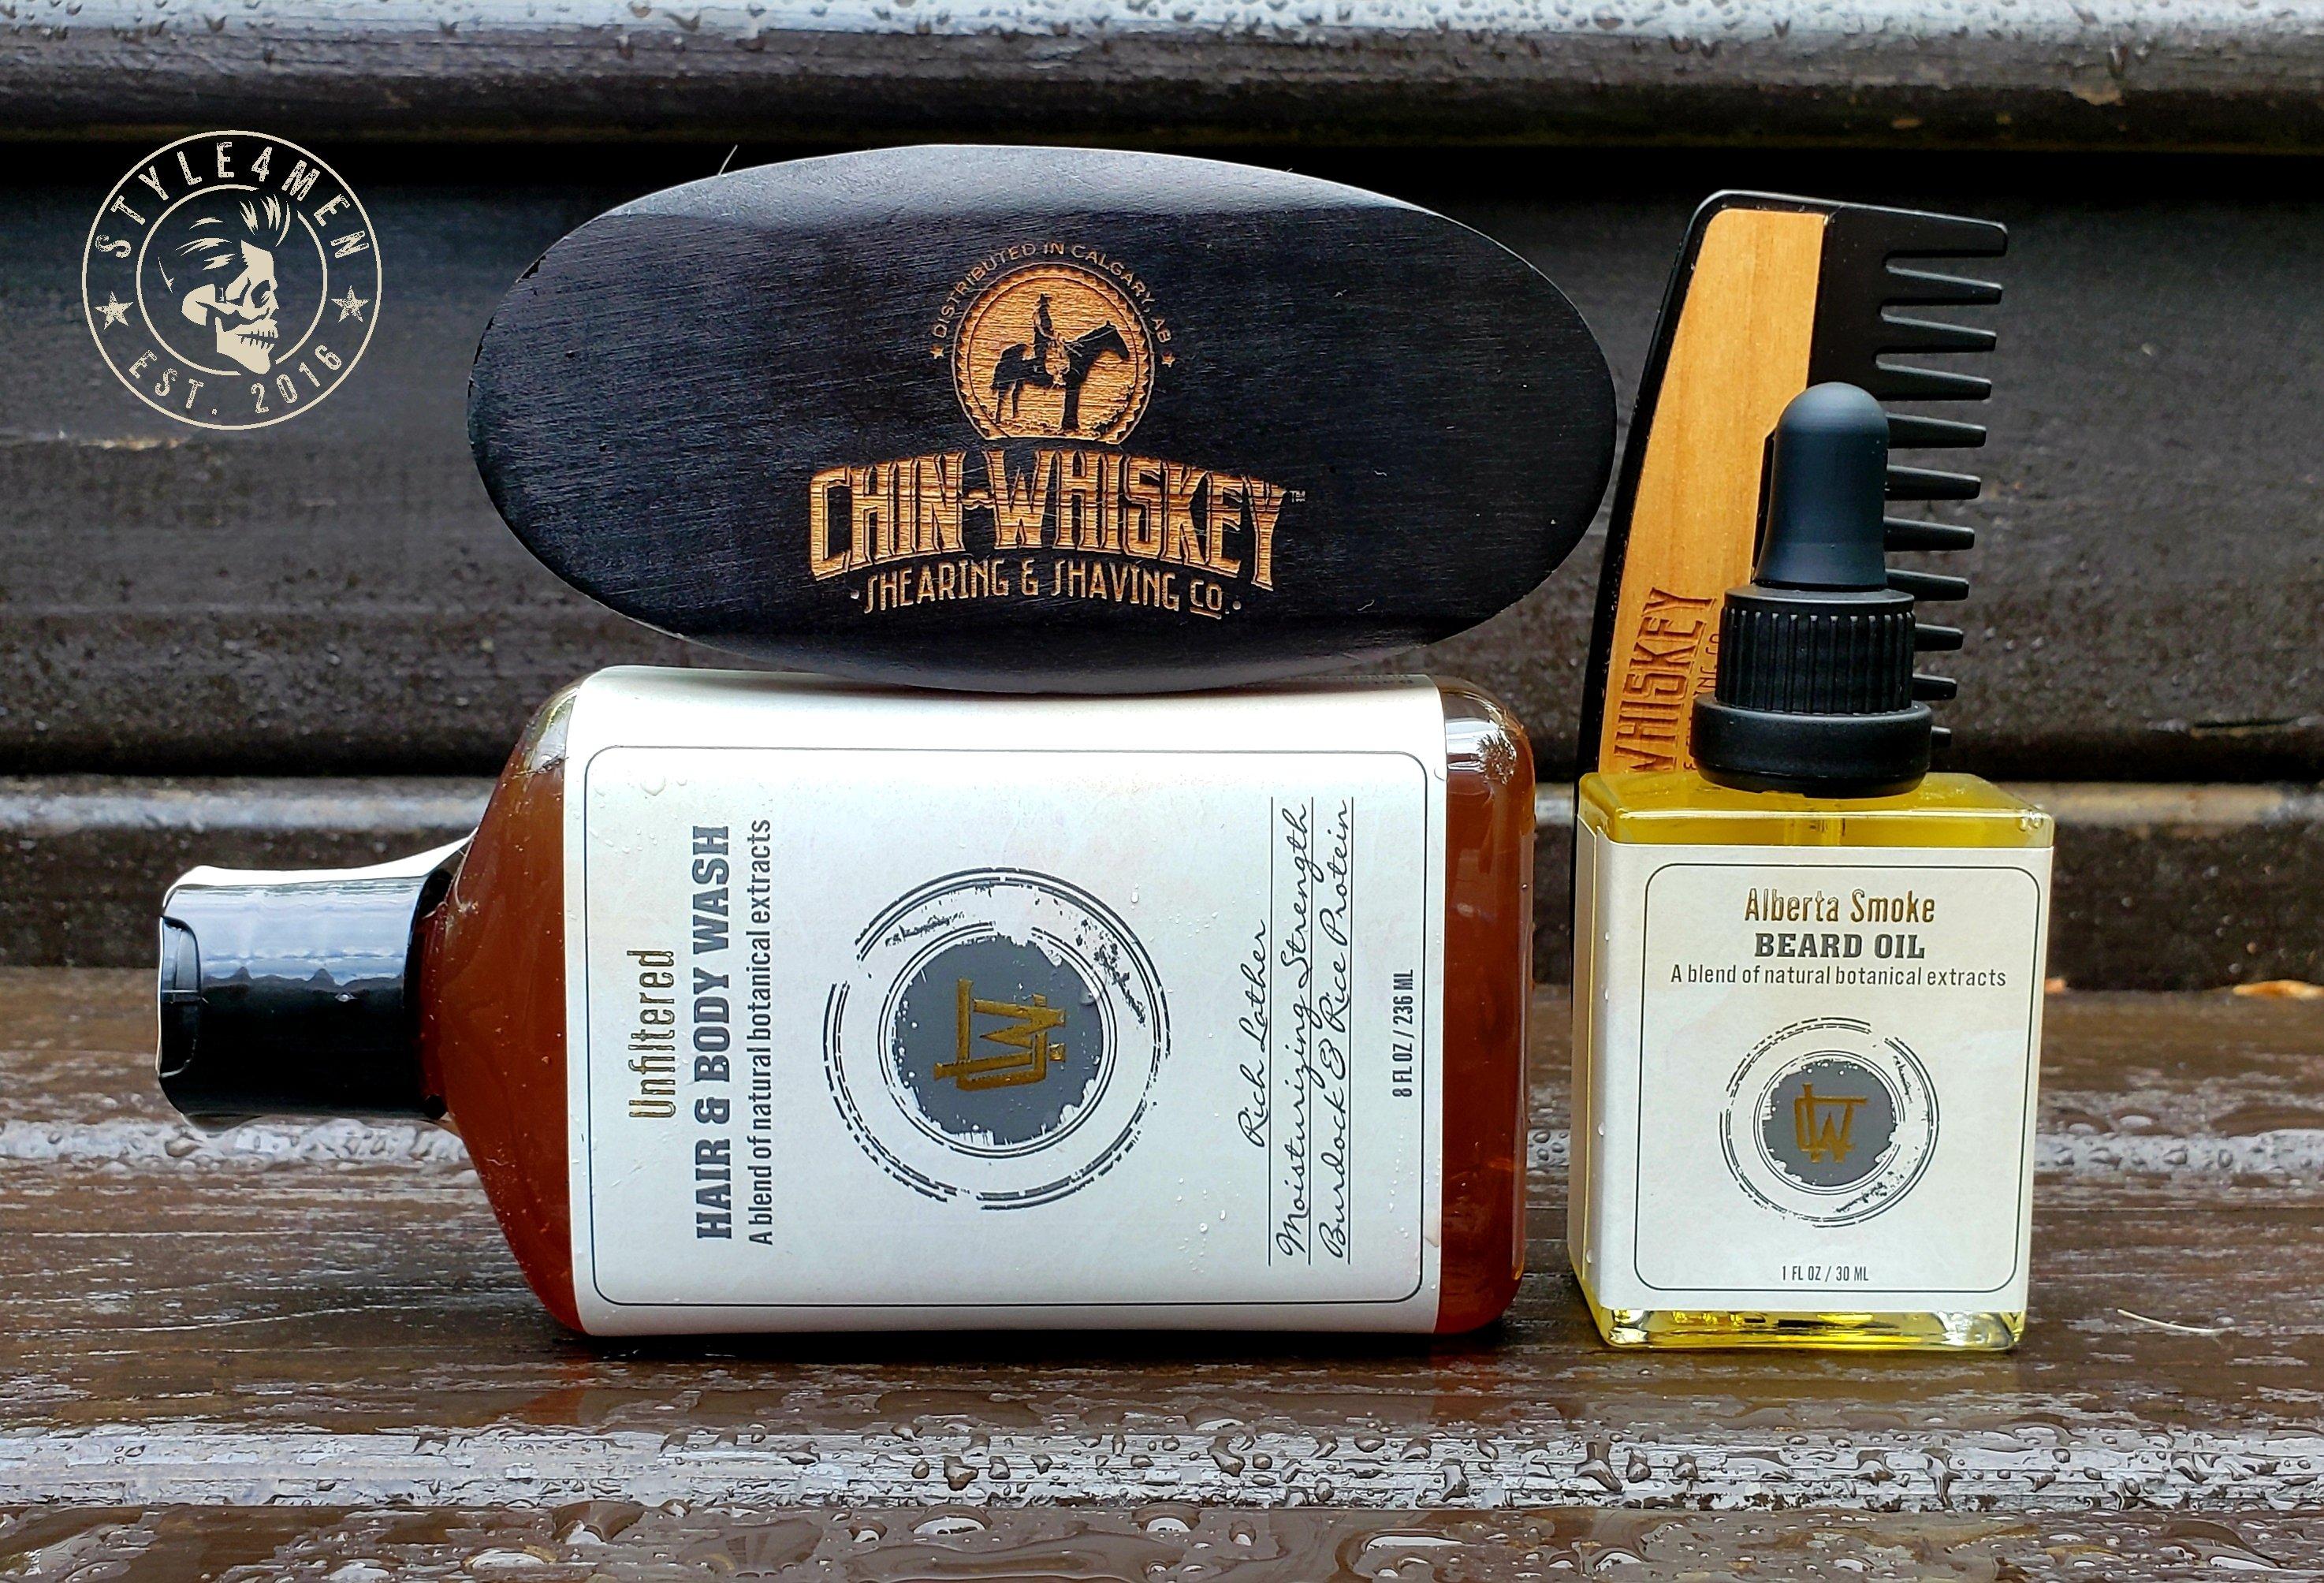 Alberta Smoke Beard Kit